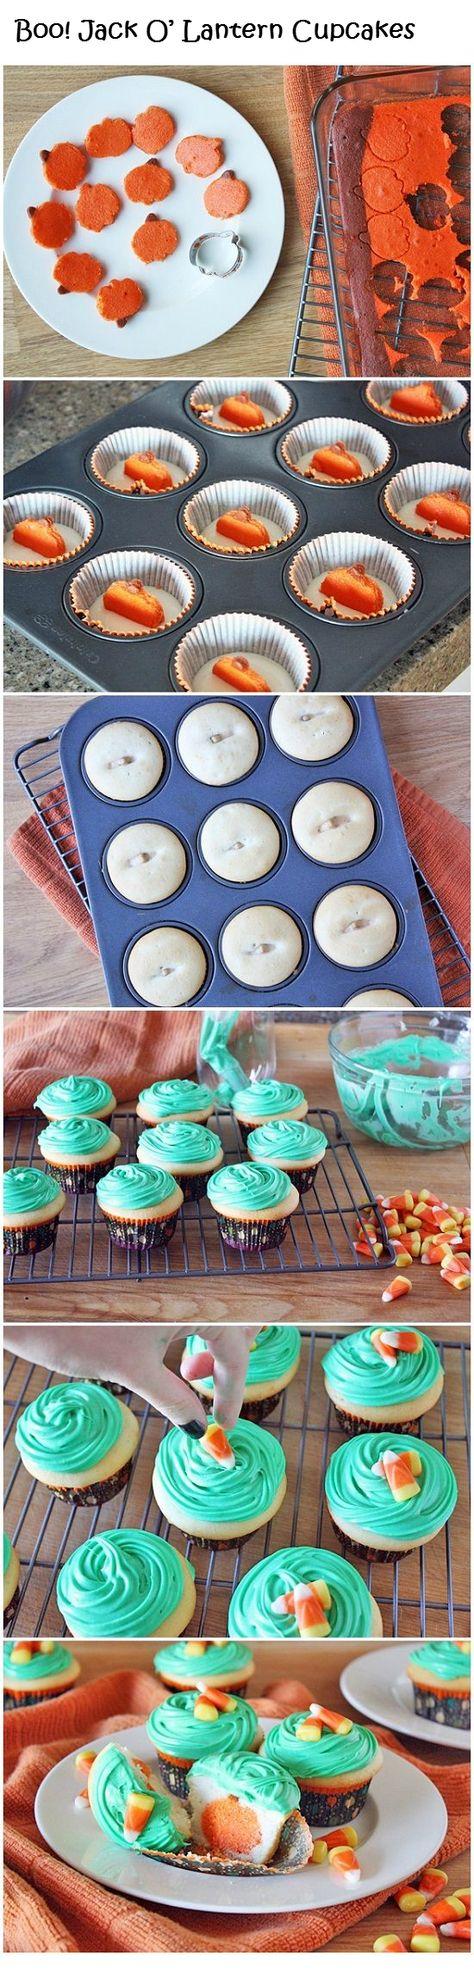 Boo! Jack O' Lantern Cupcakes